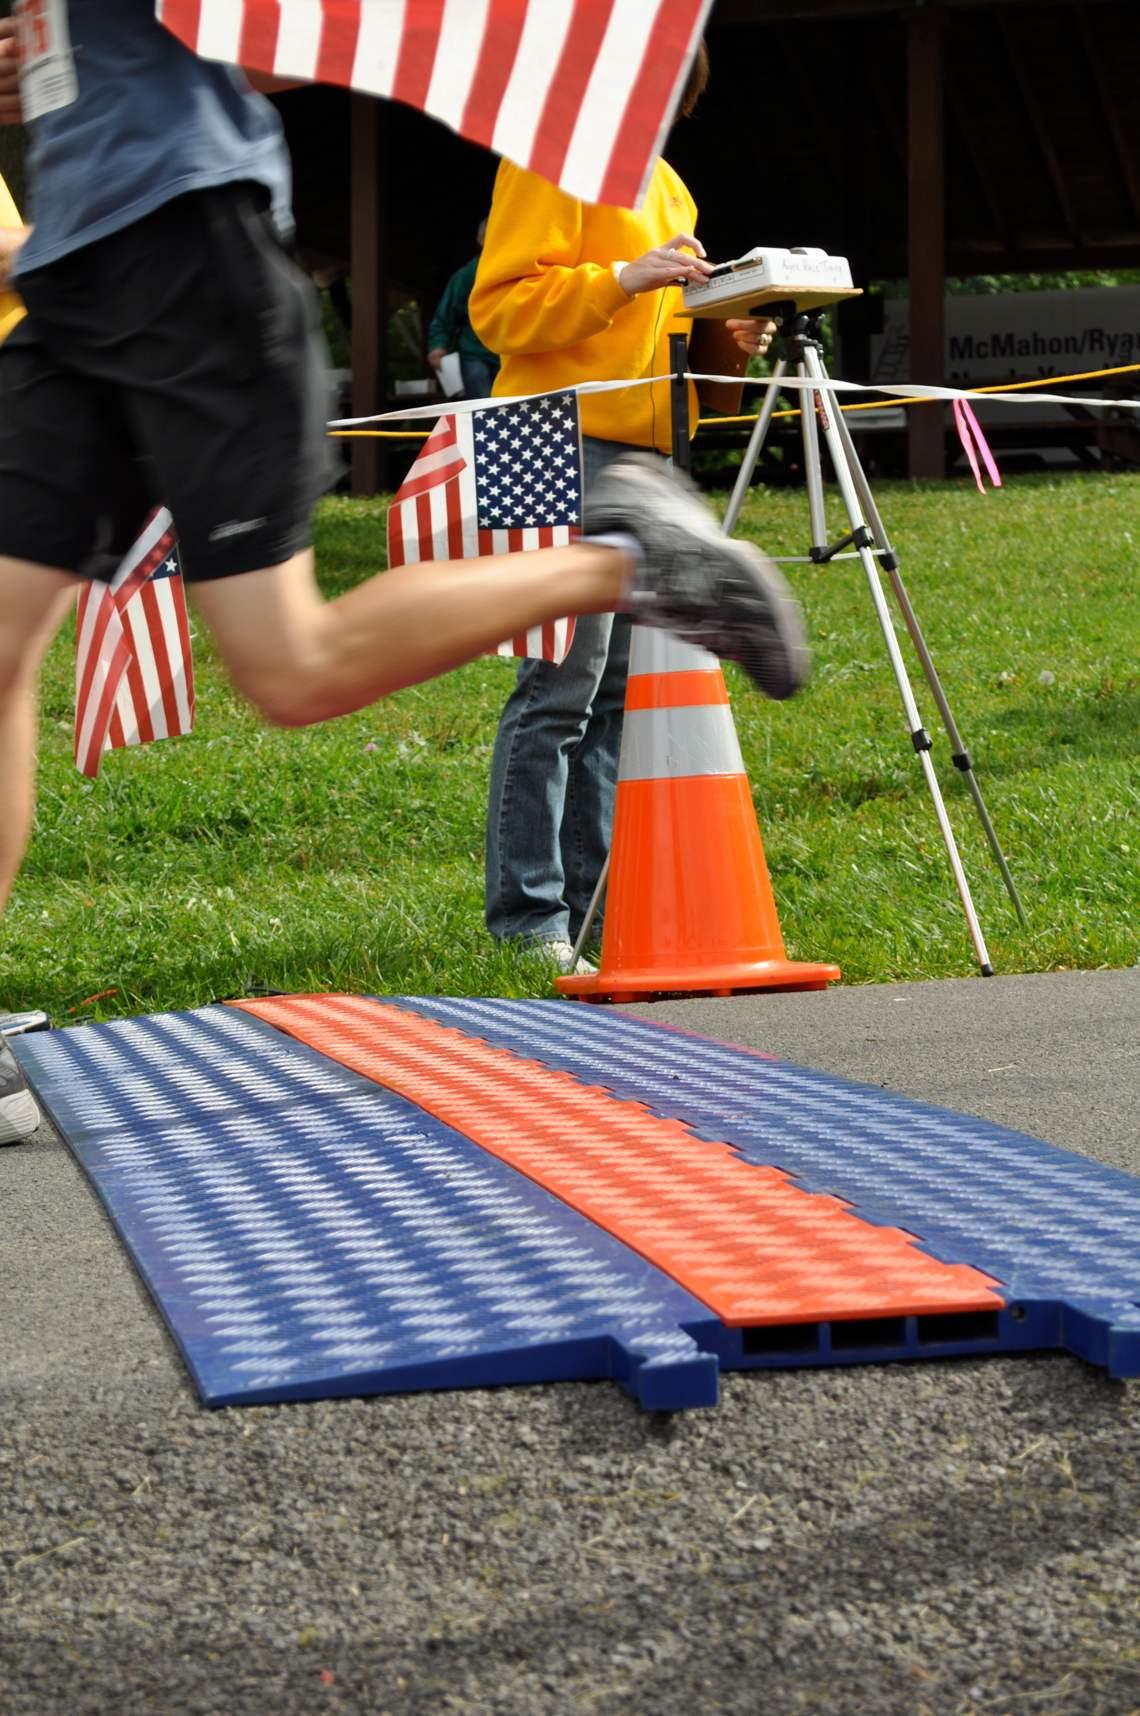 strathmore parks run finish line